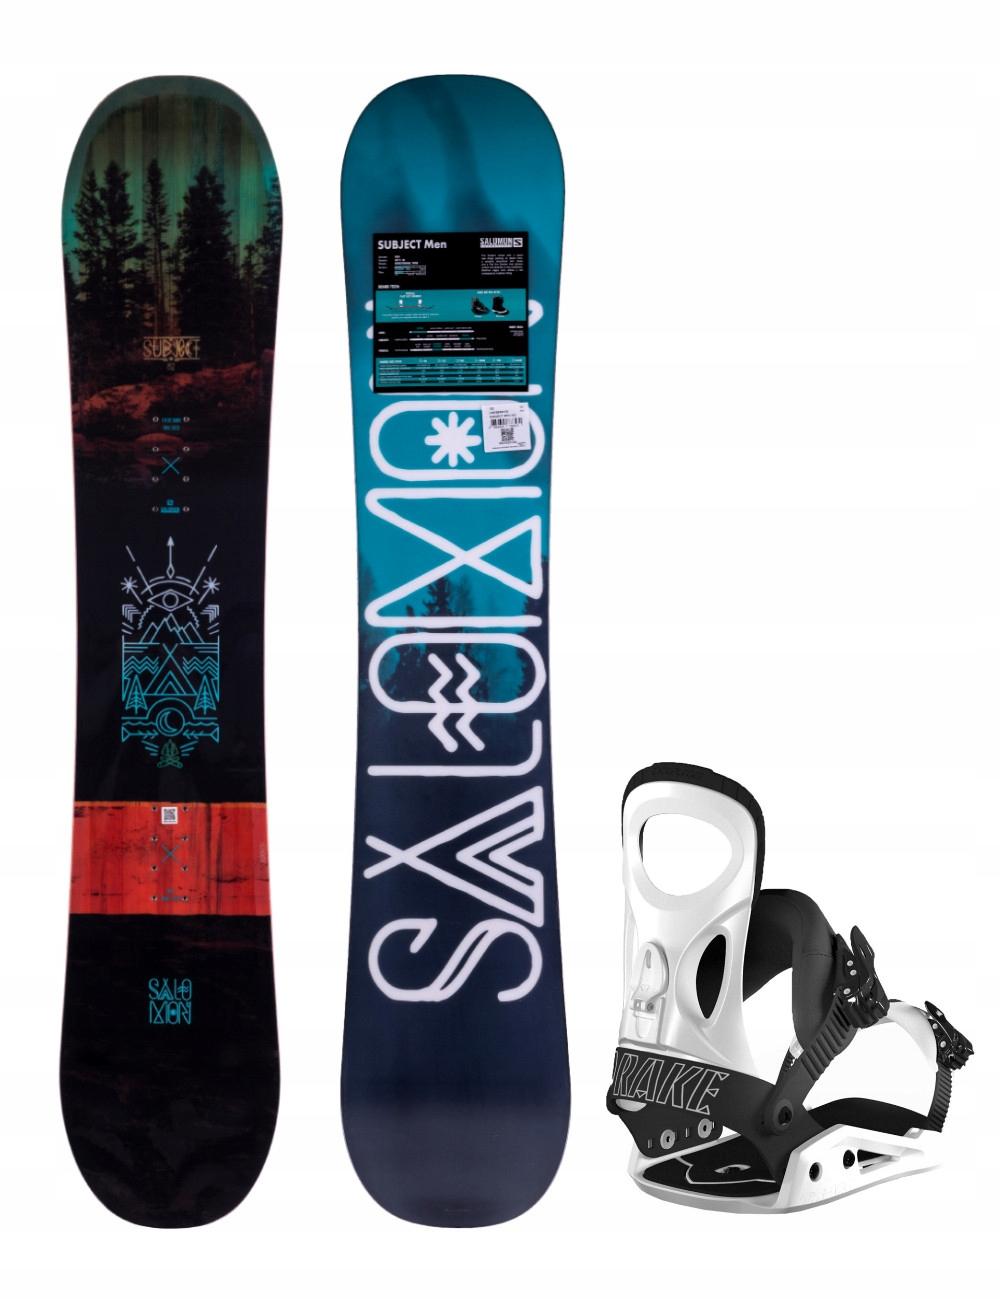 Zestaw Snowboard Salomon Subject 159 + Drake King